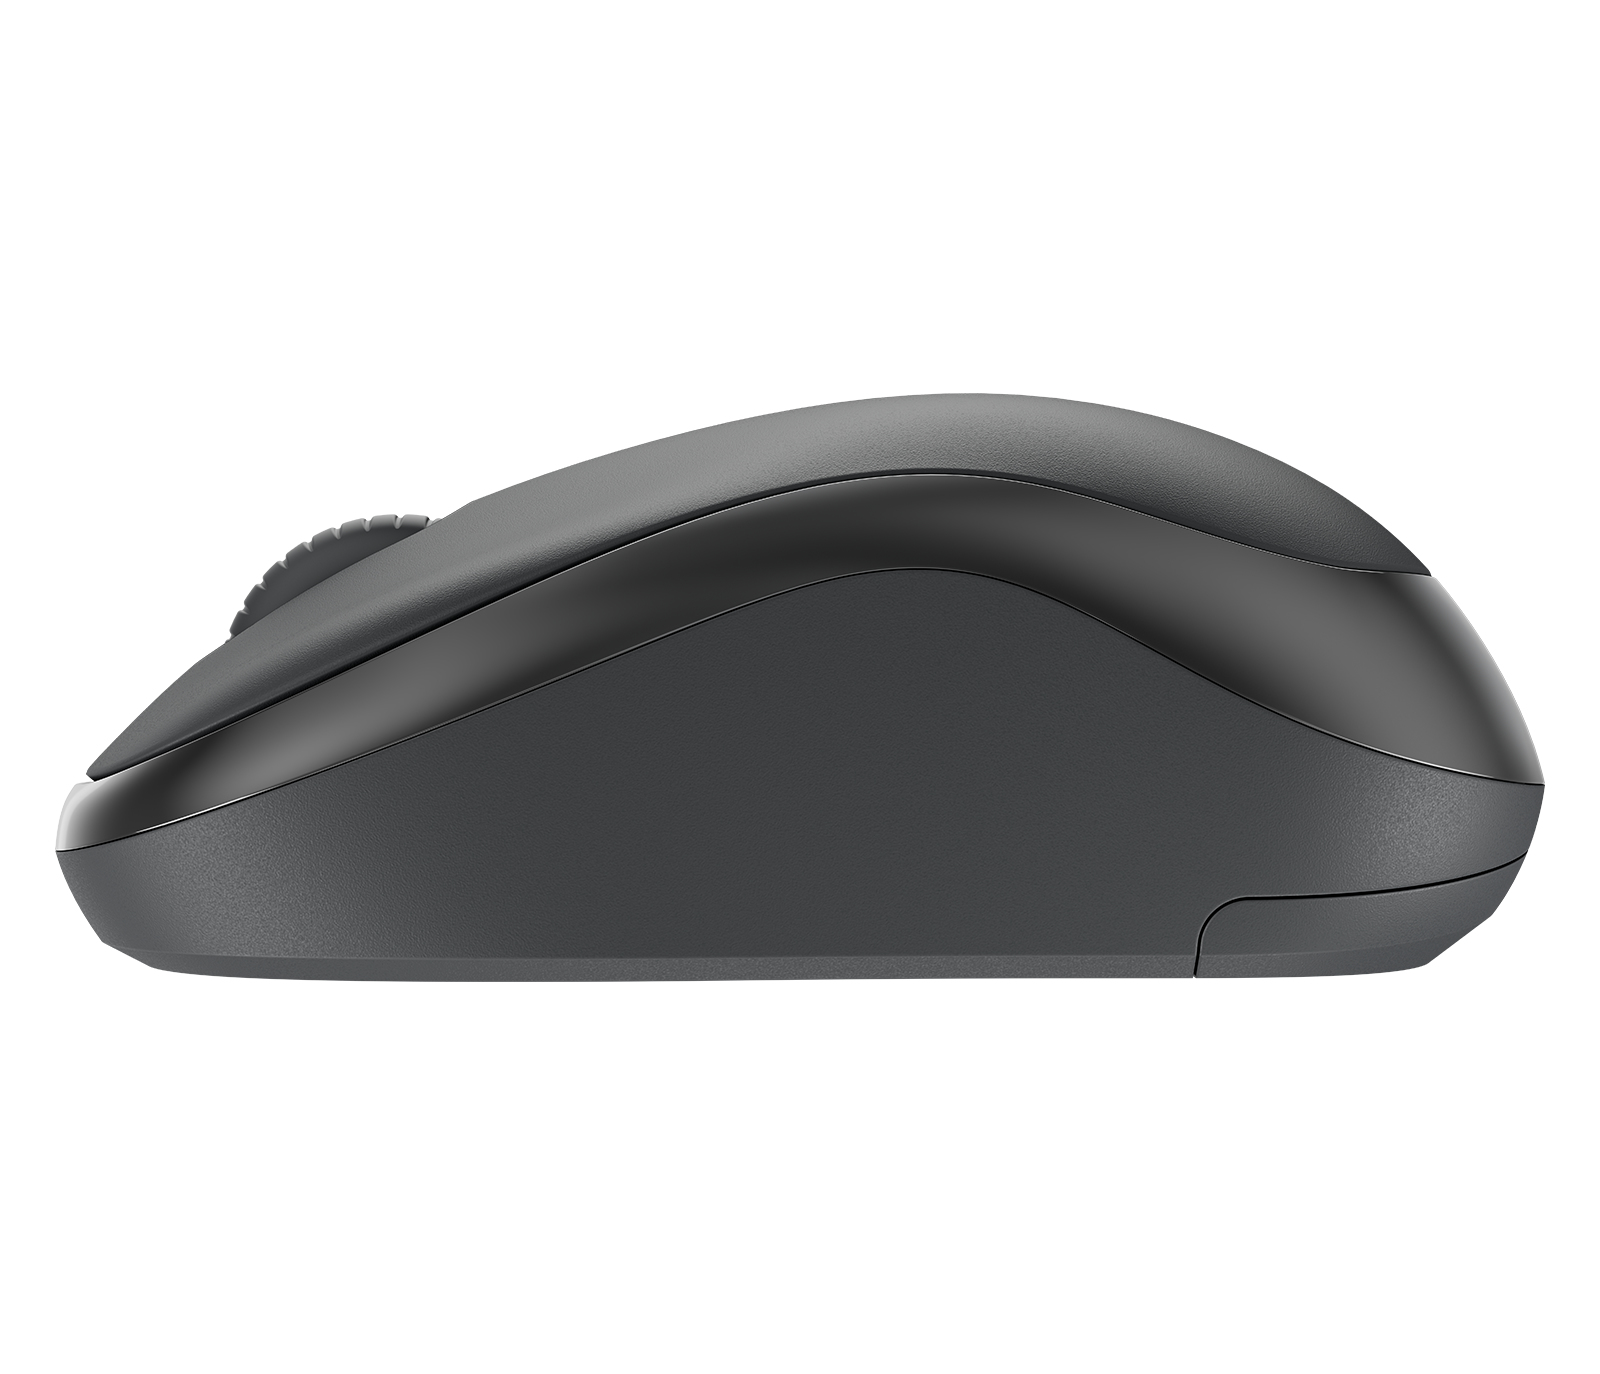 Logitech MK295 Silent Wireless Combo tastatur RF kabel-fri QWERTY Pan Nordisk Svart